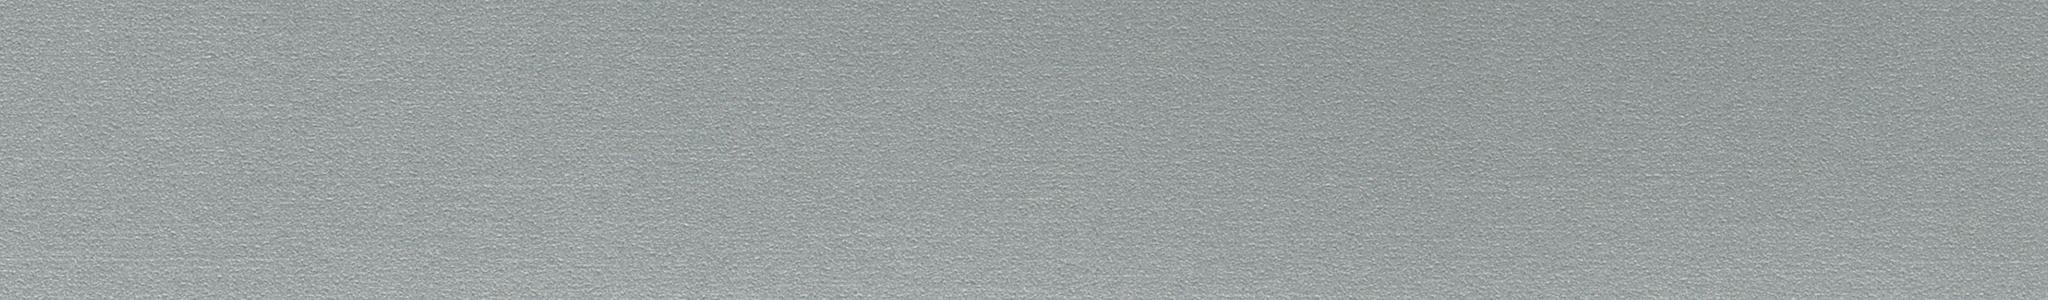 HD 29500 ABS hrana inox metalik perla